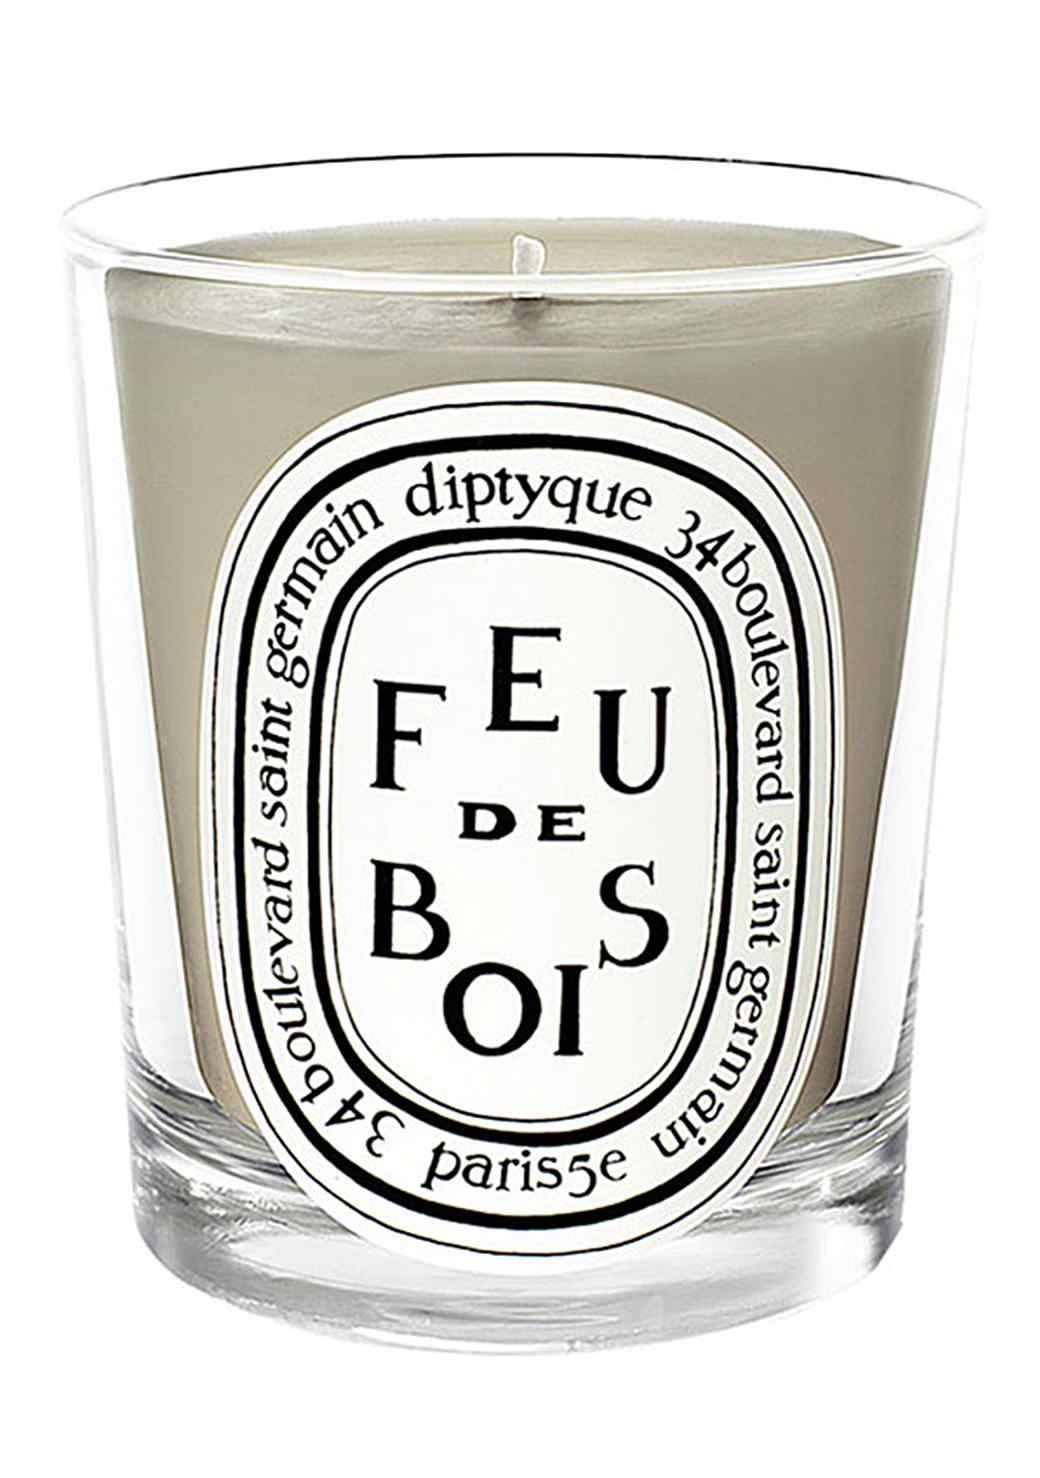 feu-de-bois-candle-1015.jpg (skyword:196066)